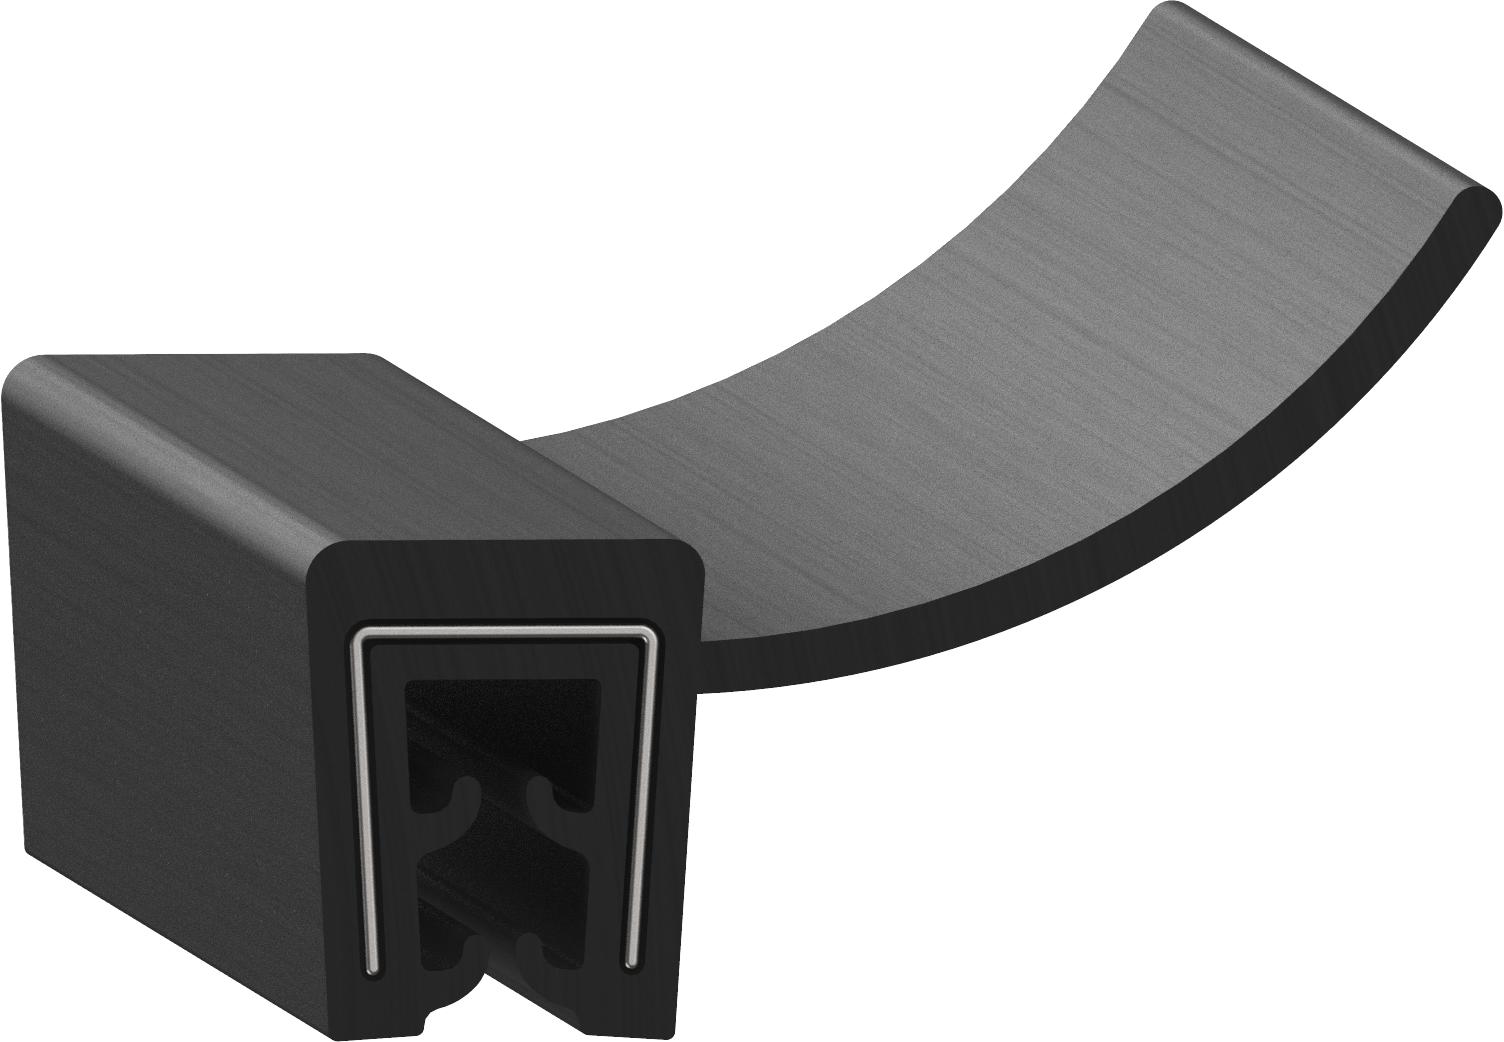 Uni-Grip part: ED-5373